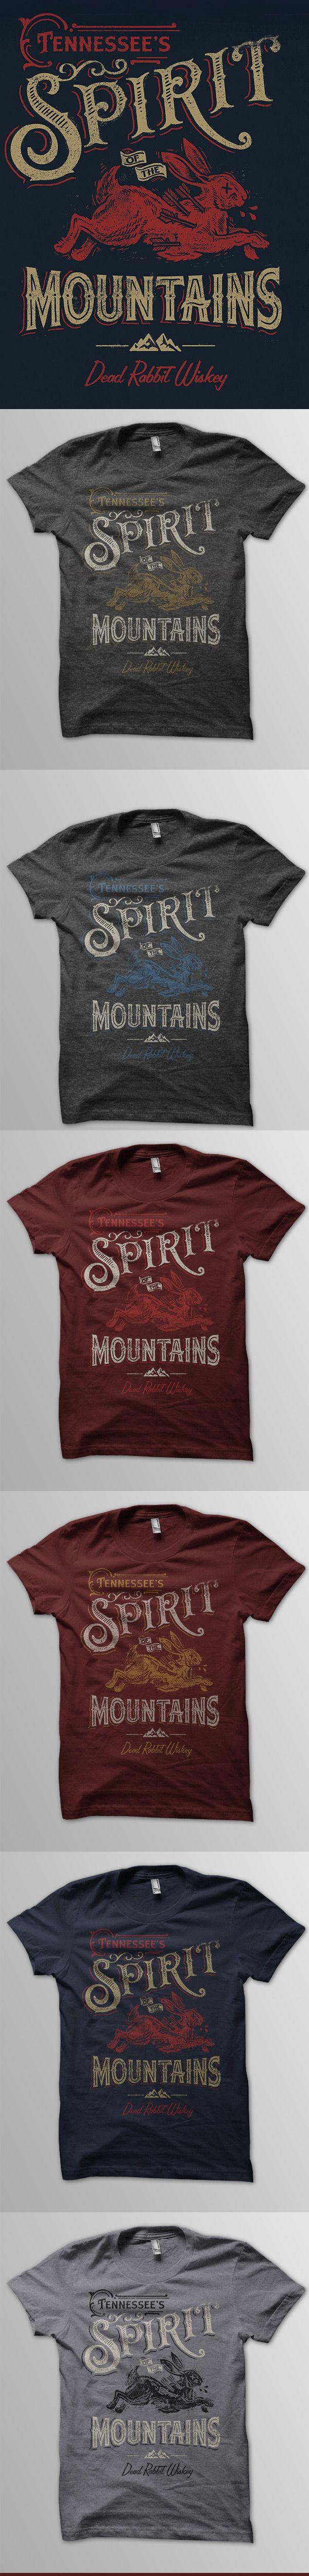 Spirit-mountains-tee-mocks-list. Hare, Rabbit, arrows, Mountains, Shirt, Tee, Type Typography